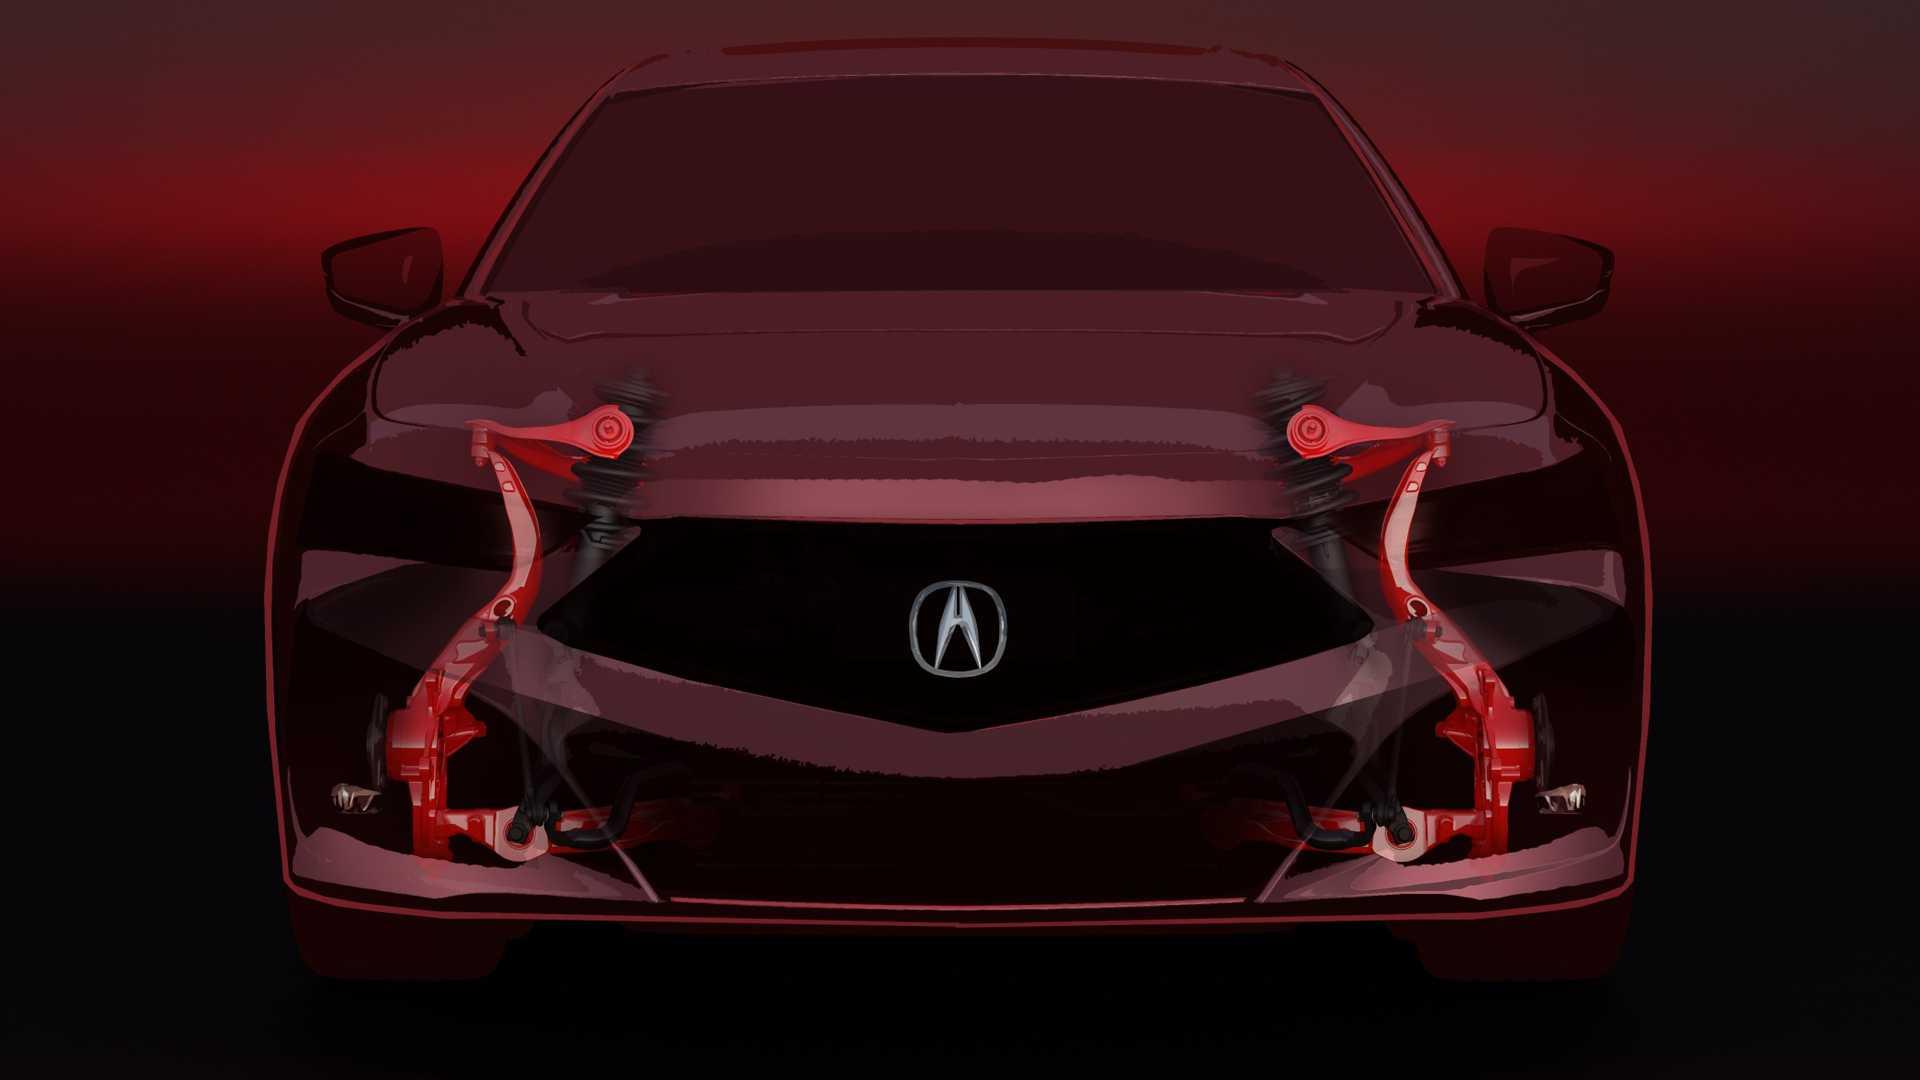 2021 Acura TLX Teases New Suspension Promises Sharper Cornering 1920x1080